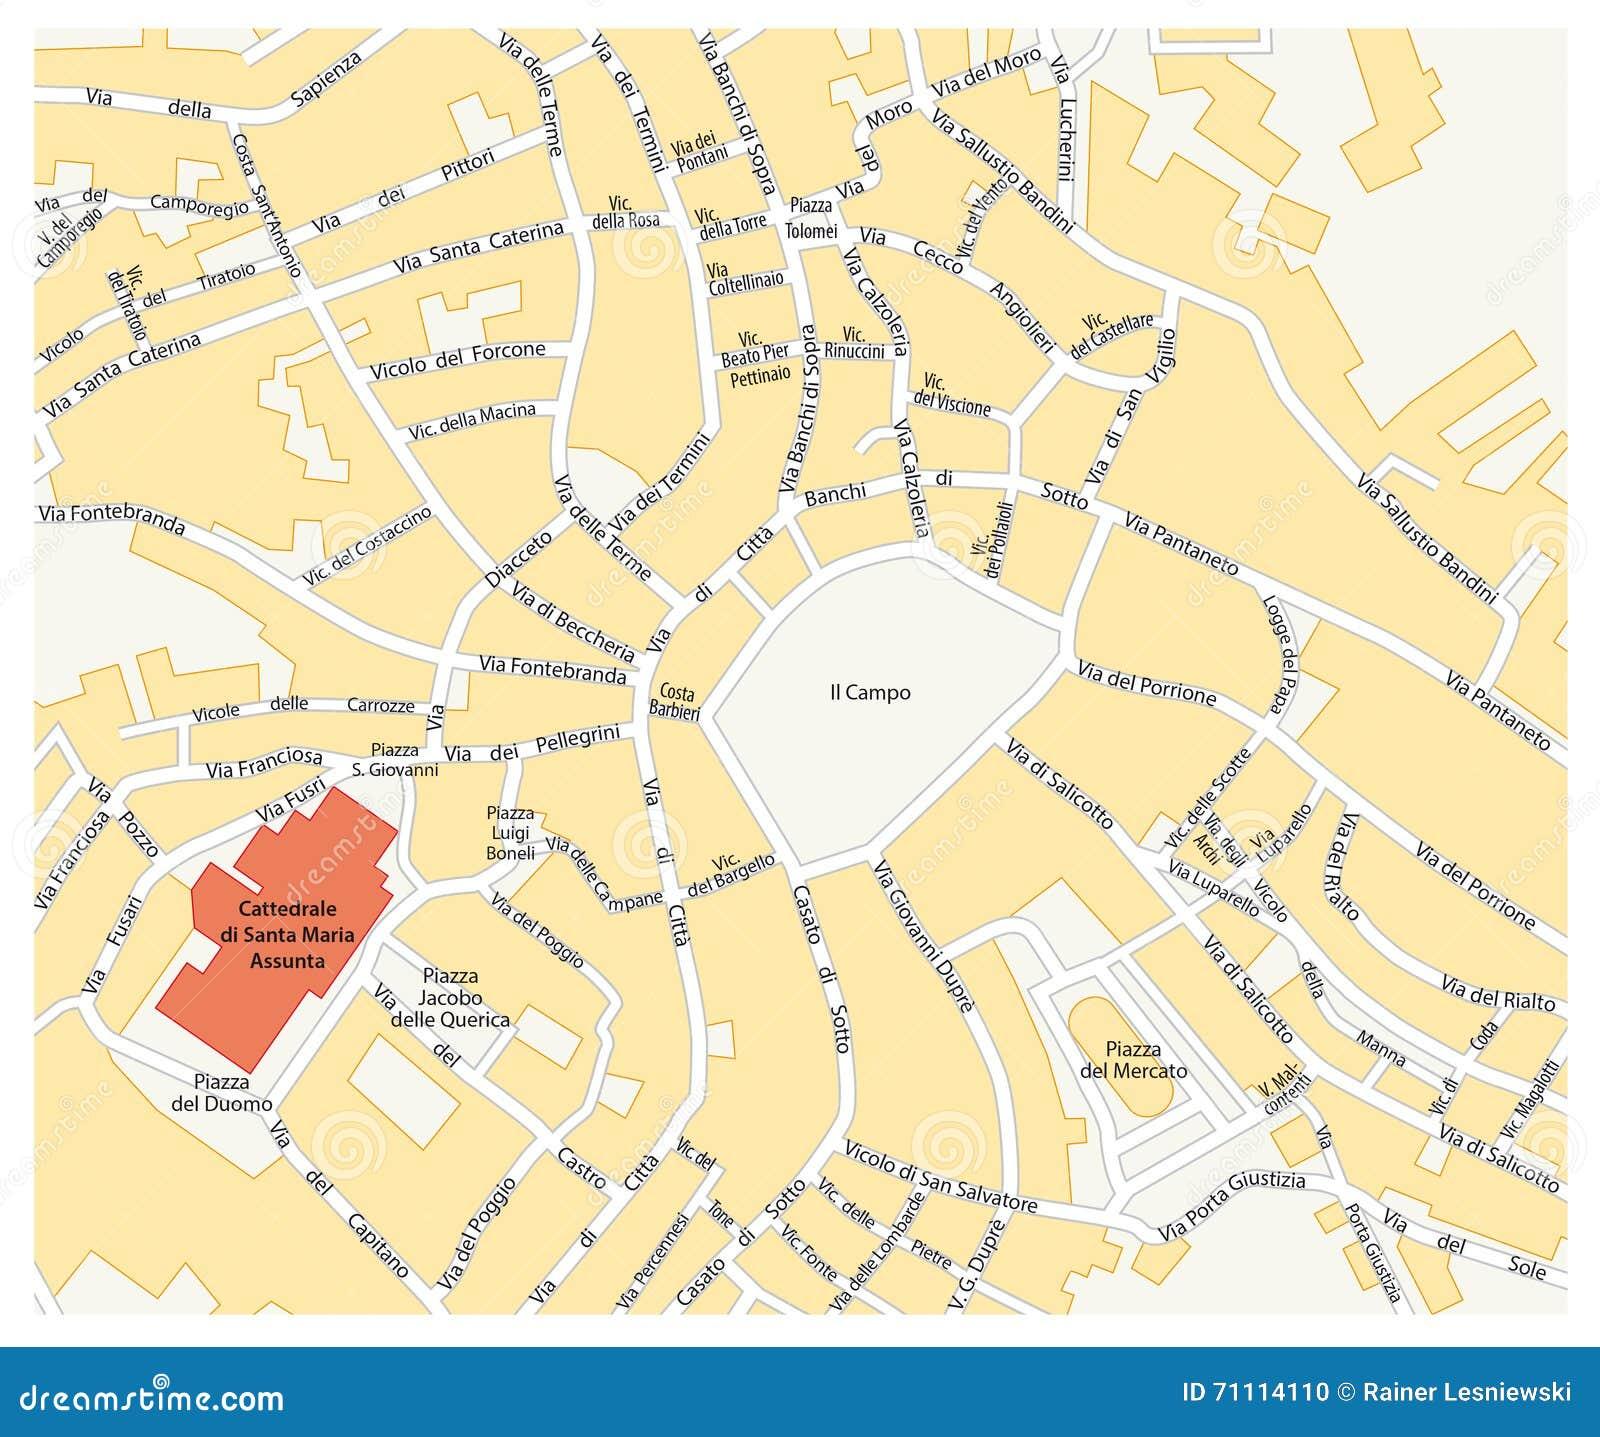 Siena city map, Italy stock illustration. Illustration of ... on city map of kahoolawe, city map of bolivia, city map of estonia, city map of the netherlands, city map of slovenia, city map of libya, city map of tanzania, city map of myanmar, city map of the carolinas, city map of bosnia and herzegovina, city map of kuwait, city map of slovakia, city map of antigua, city map of latin america, city map of aruba, city map of tuscany, city map of bahrain, city map of mesopotamia, city map of luxembourg, city map of holland,